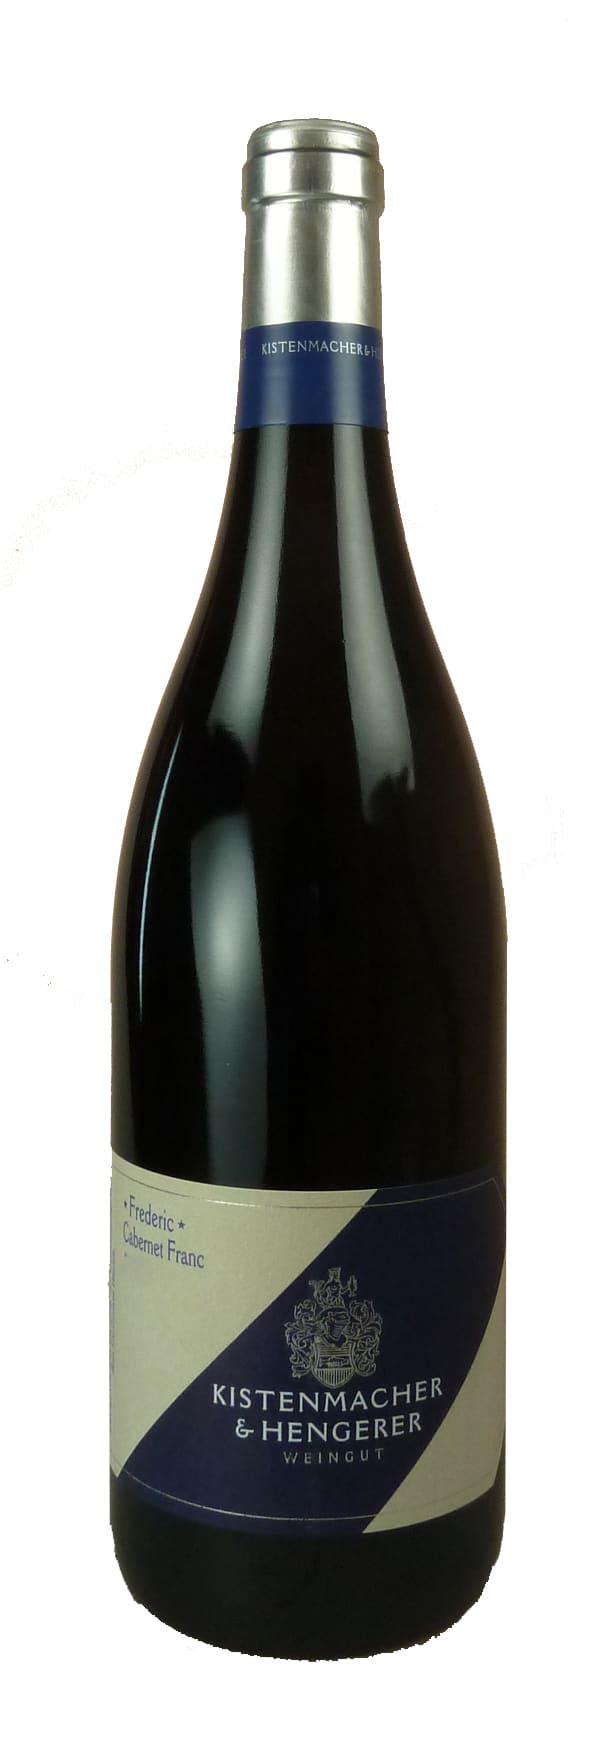 Frederic Cabernet Franc Qualitätswein trocken 2014